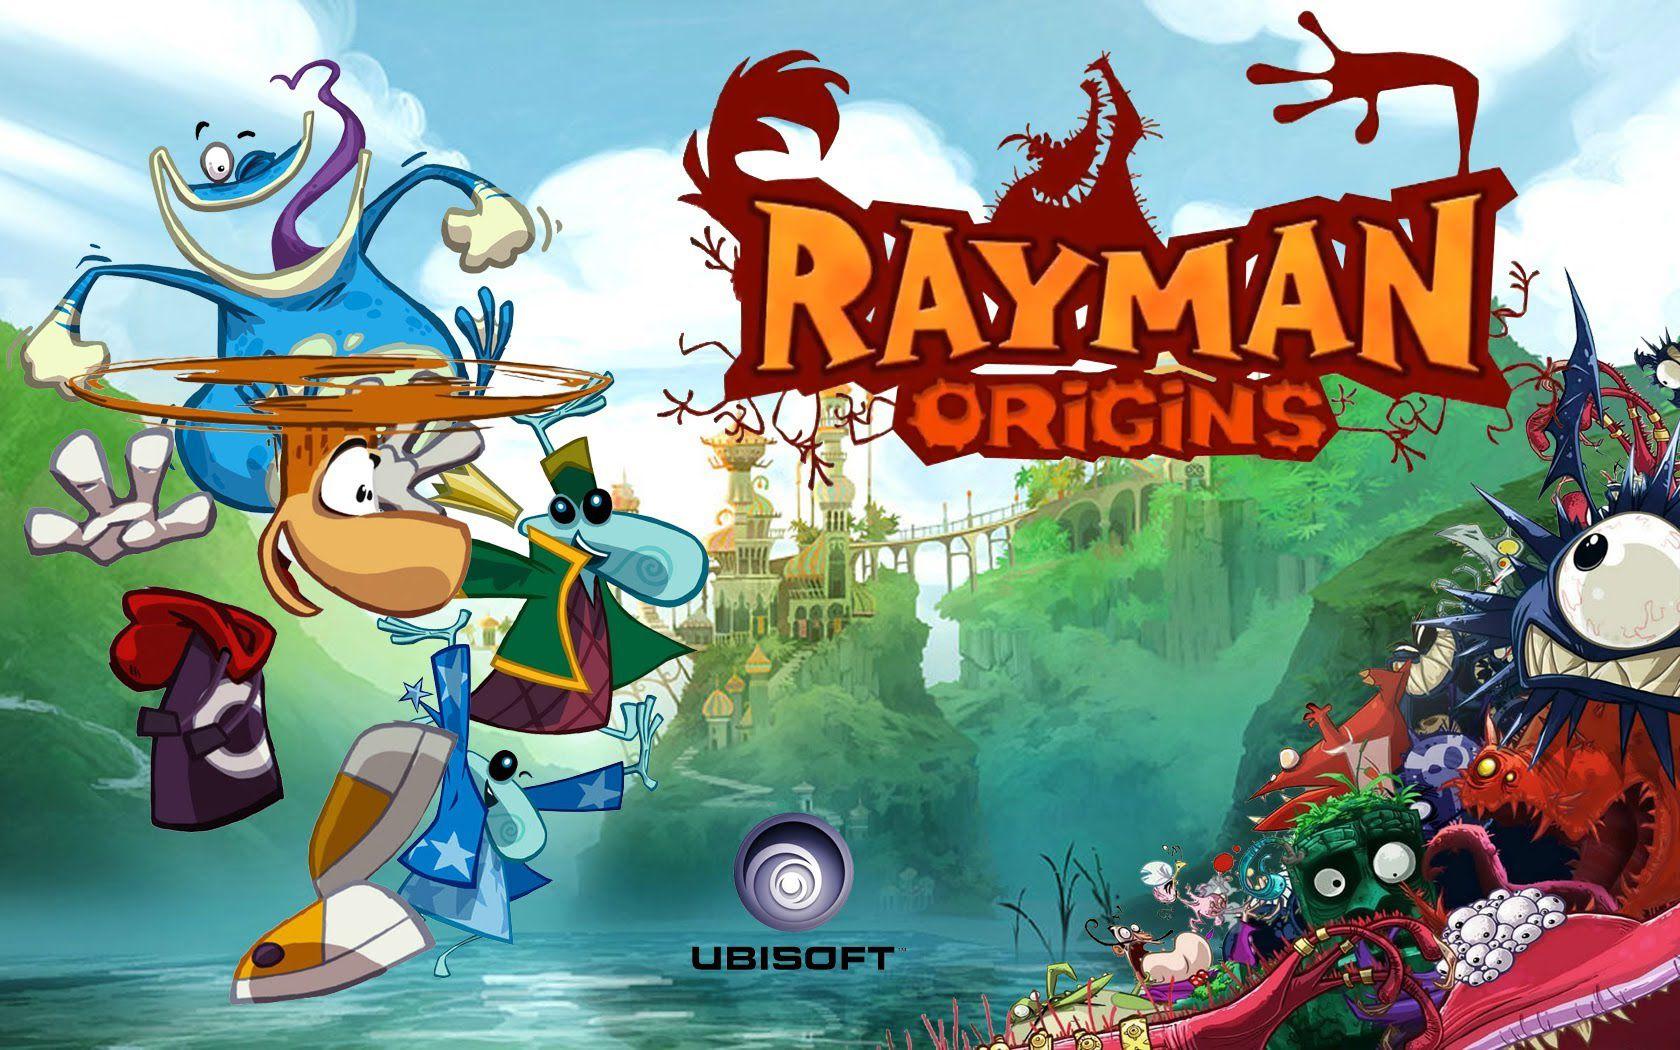 Console Xbox One X 4K 1Tb + Rayman Origens